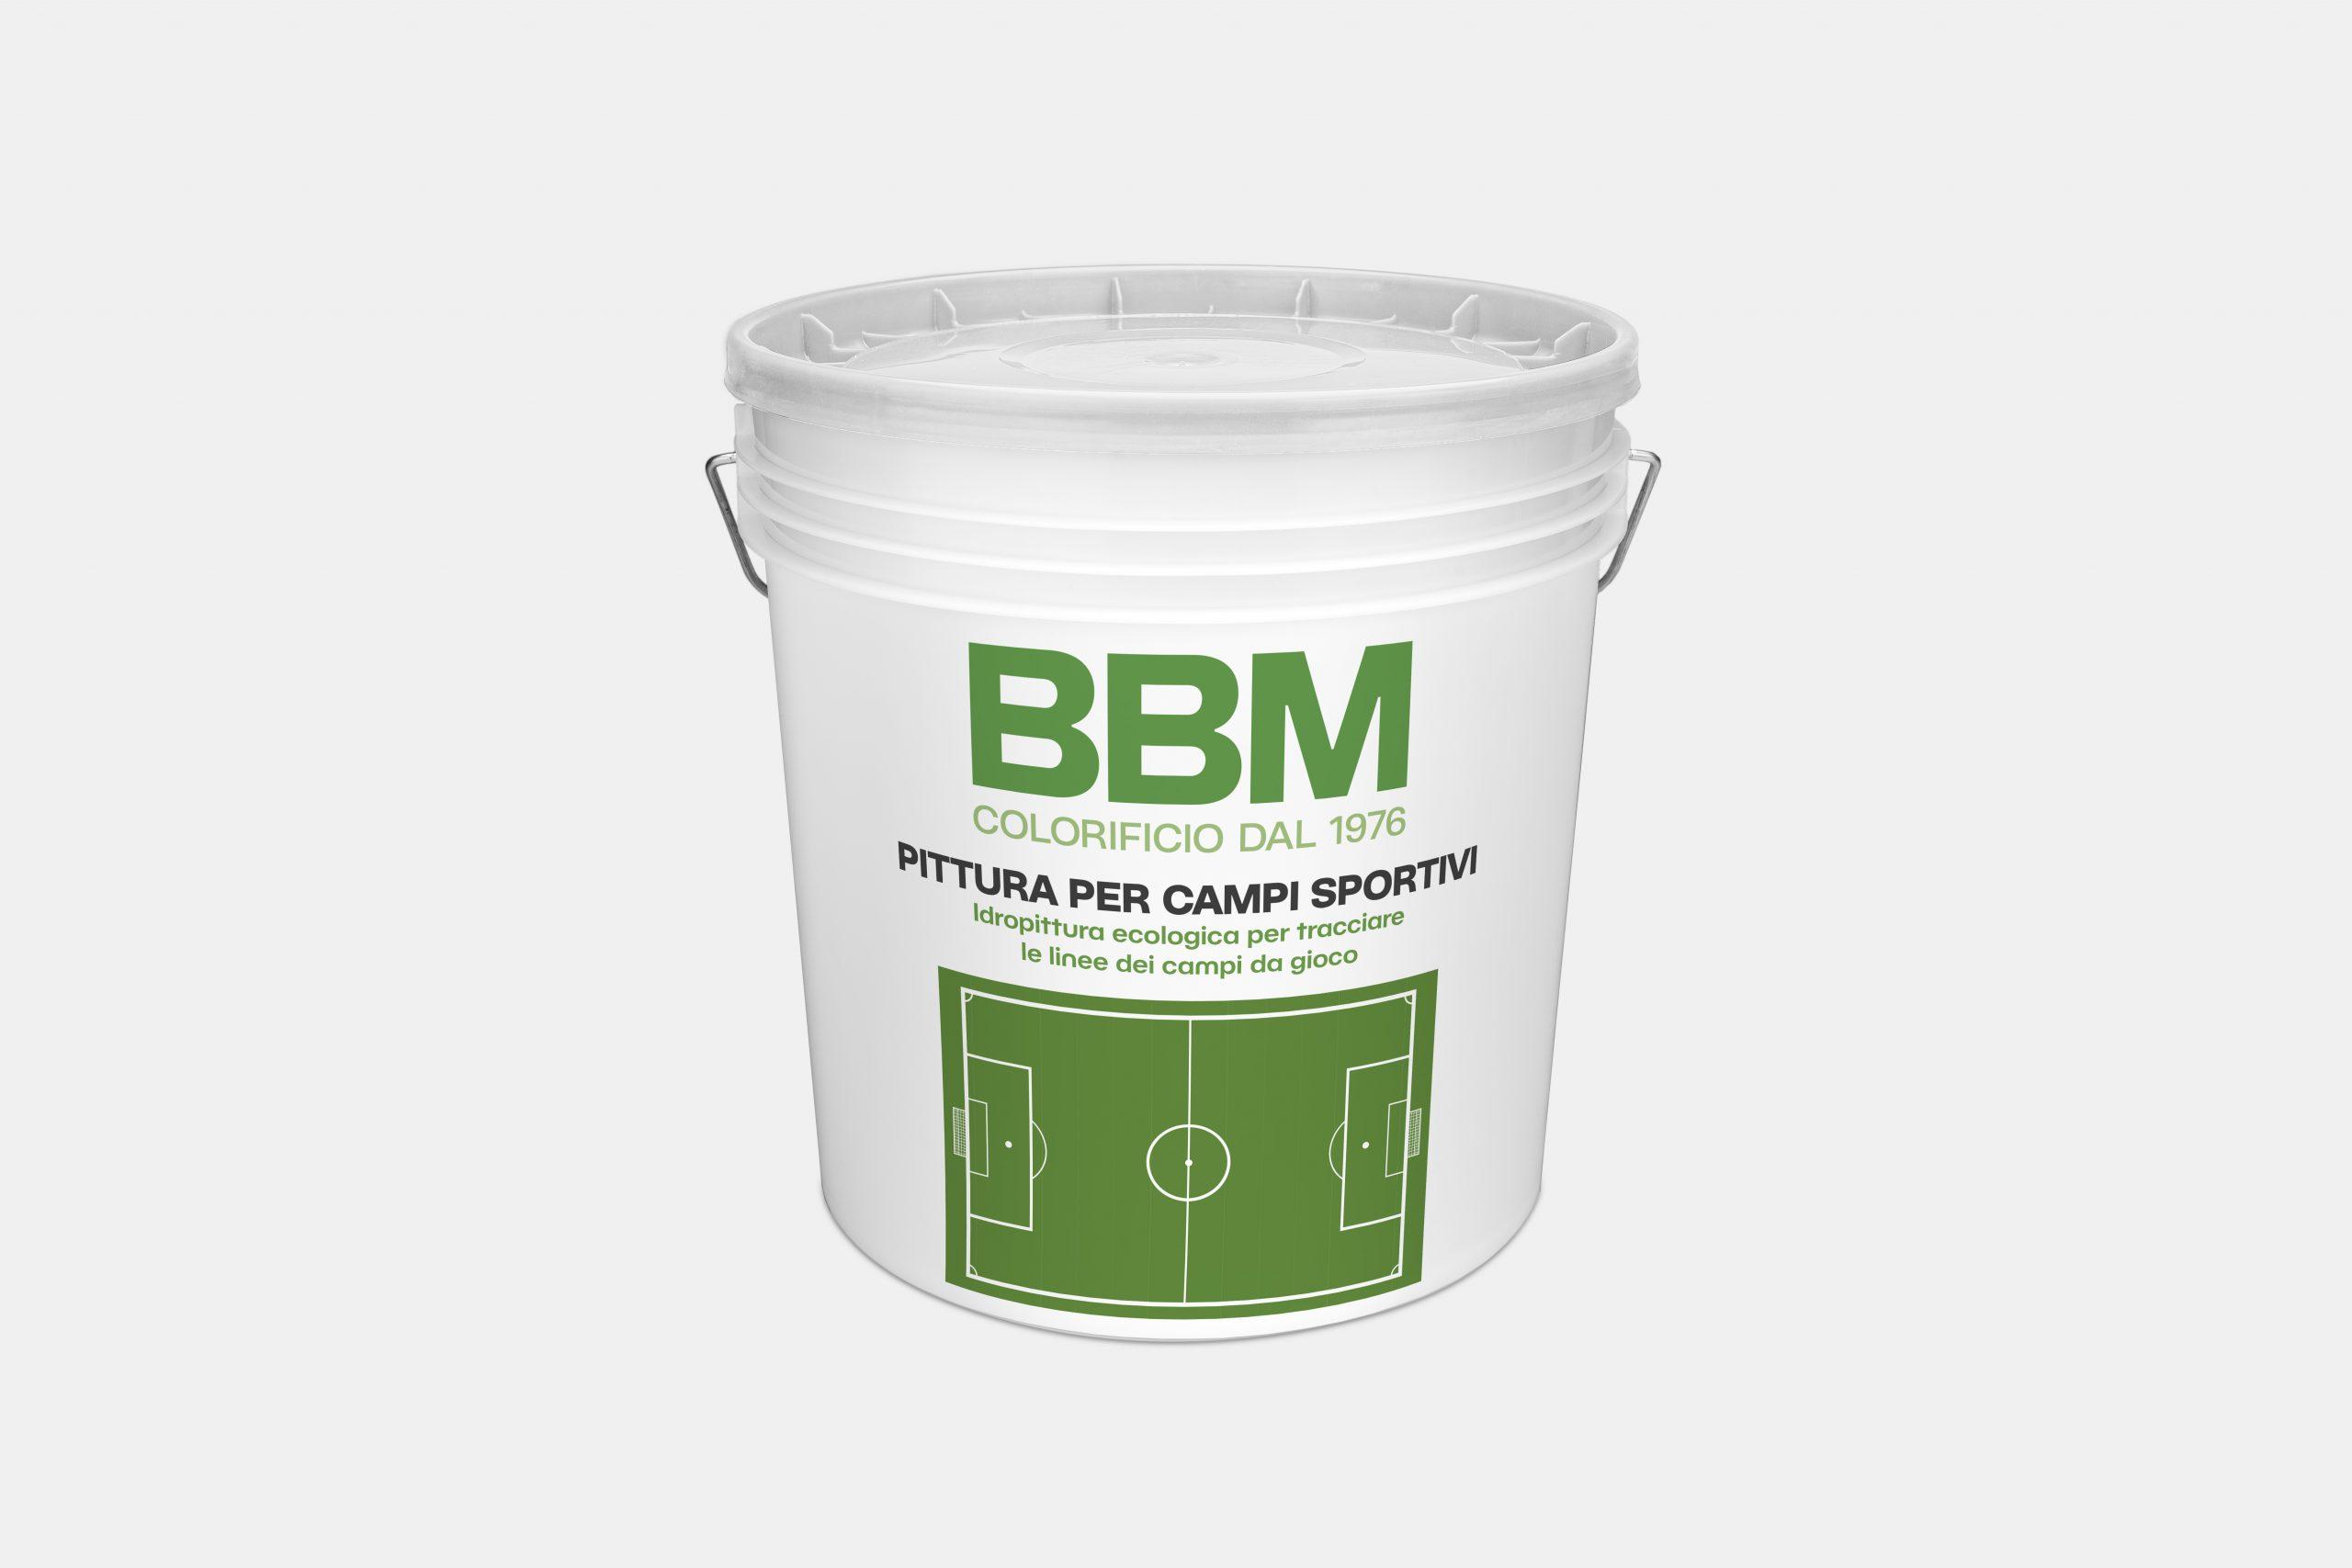 https://bbm-colorificio.it/wp-content/uploads/2021/08/Pittura-per-campi-sportivi-scaled.jpg